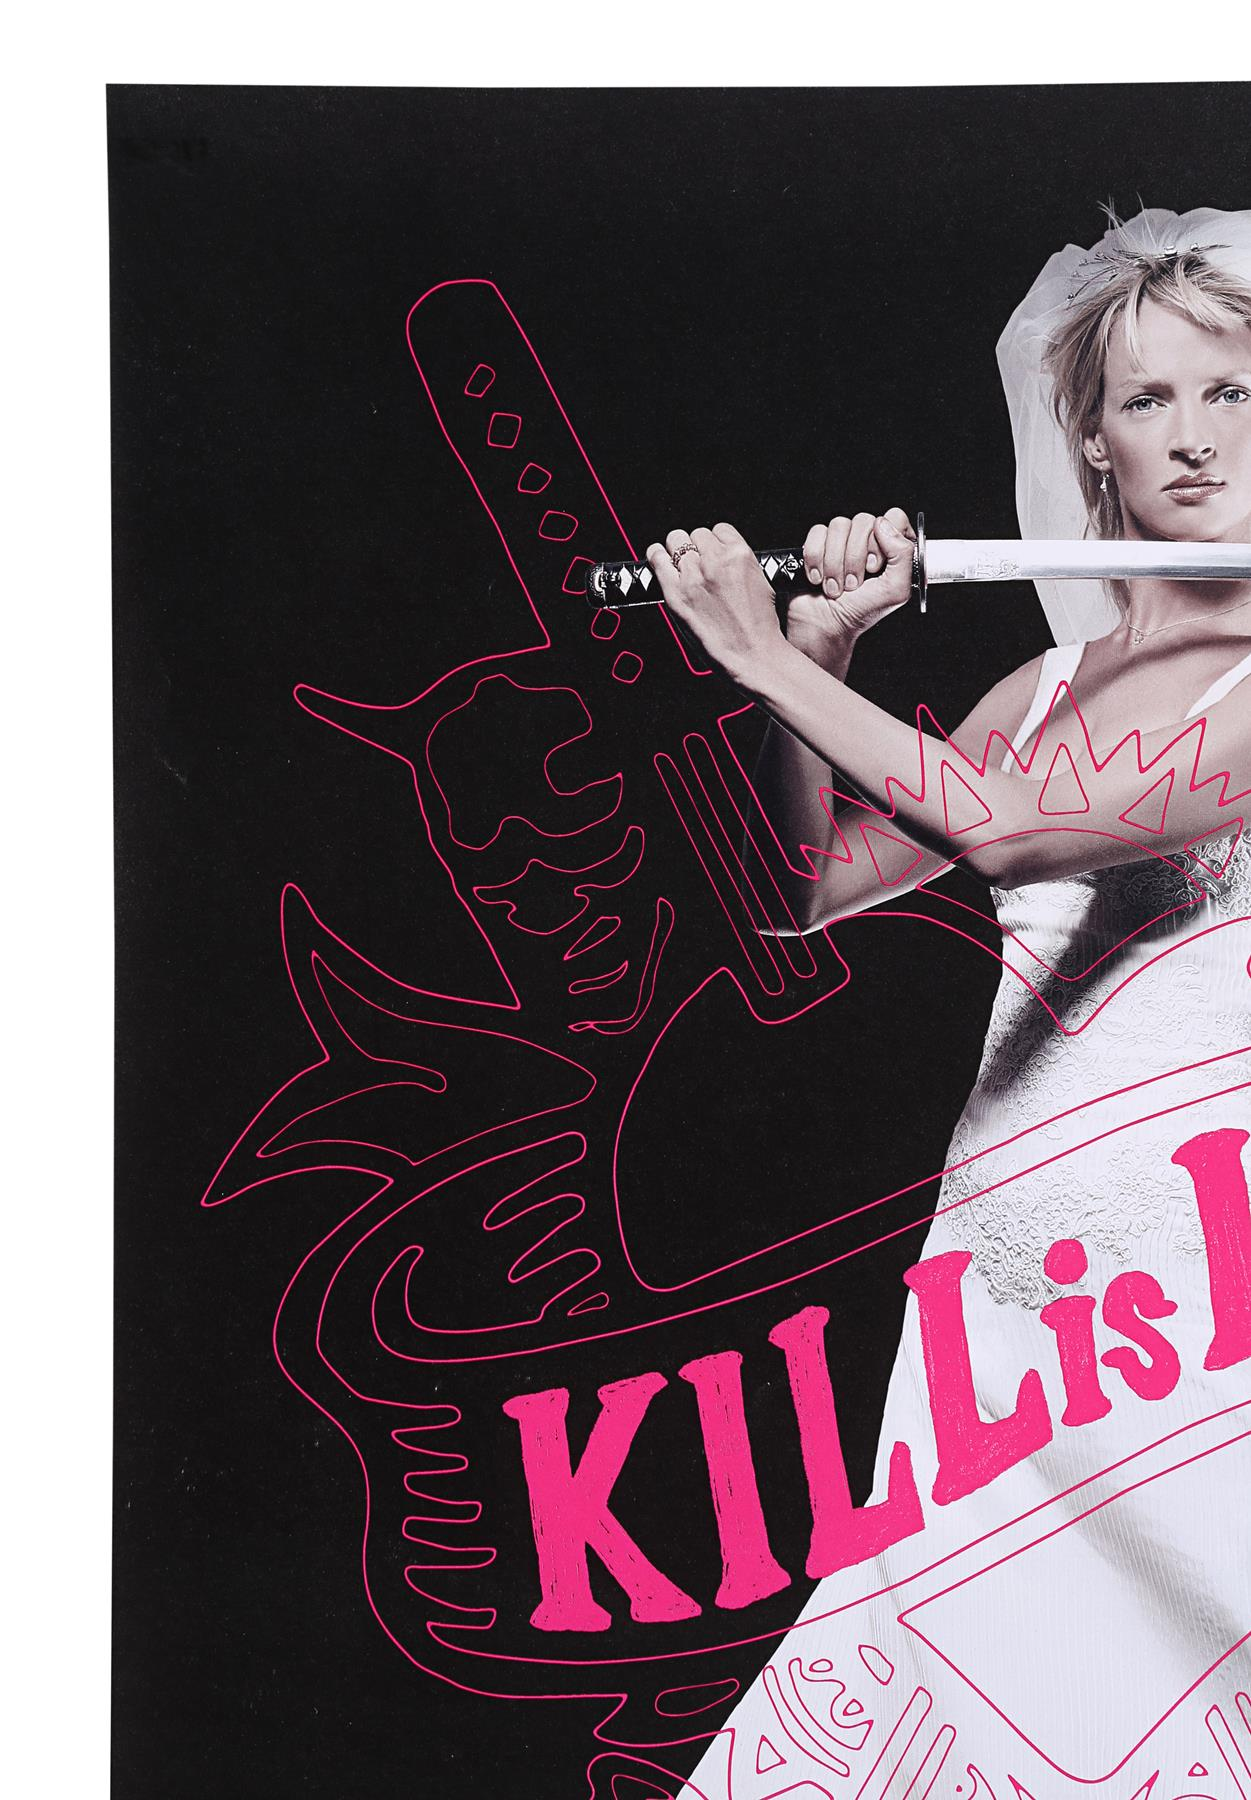 KILL BILL: VOLUME II (2004) - Japanese B2, 2004 - Image 2 of 5